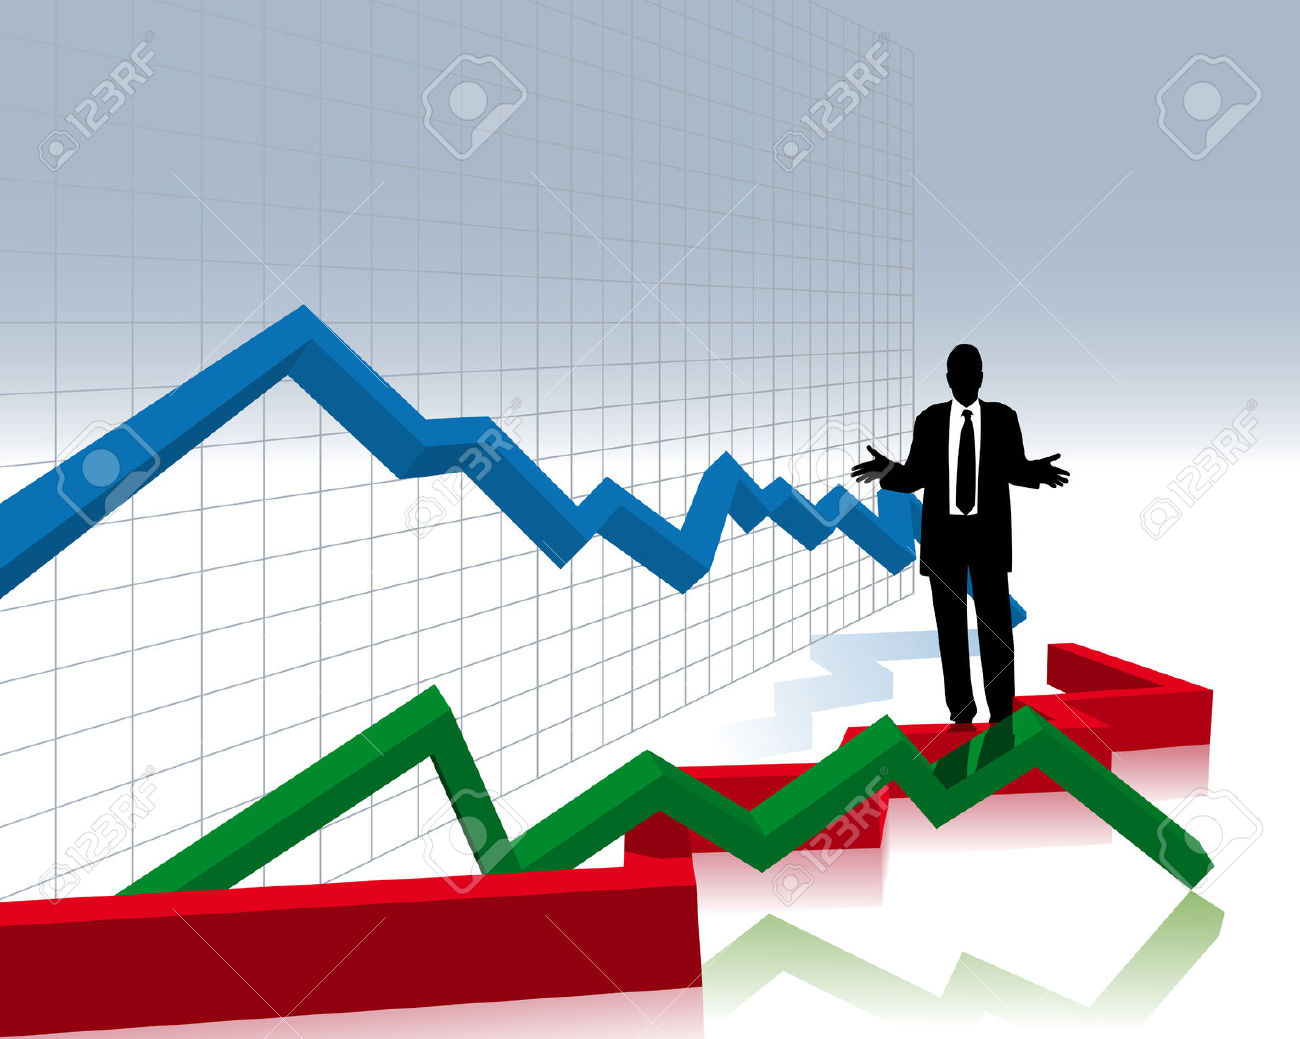 Financial Crash Royalty Free Cliparts, Vectors, And Stock.